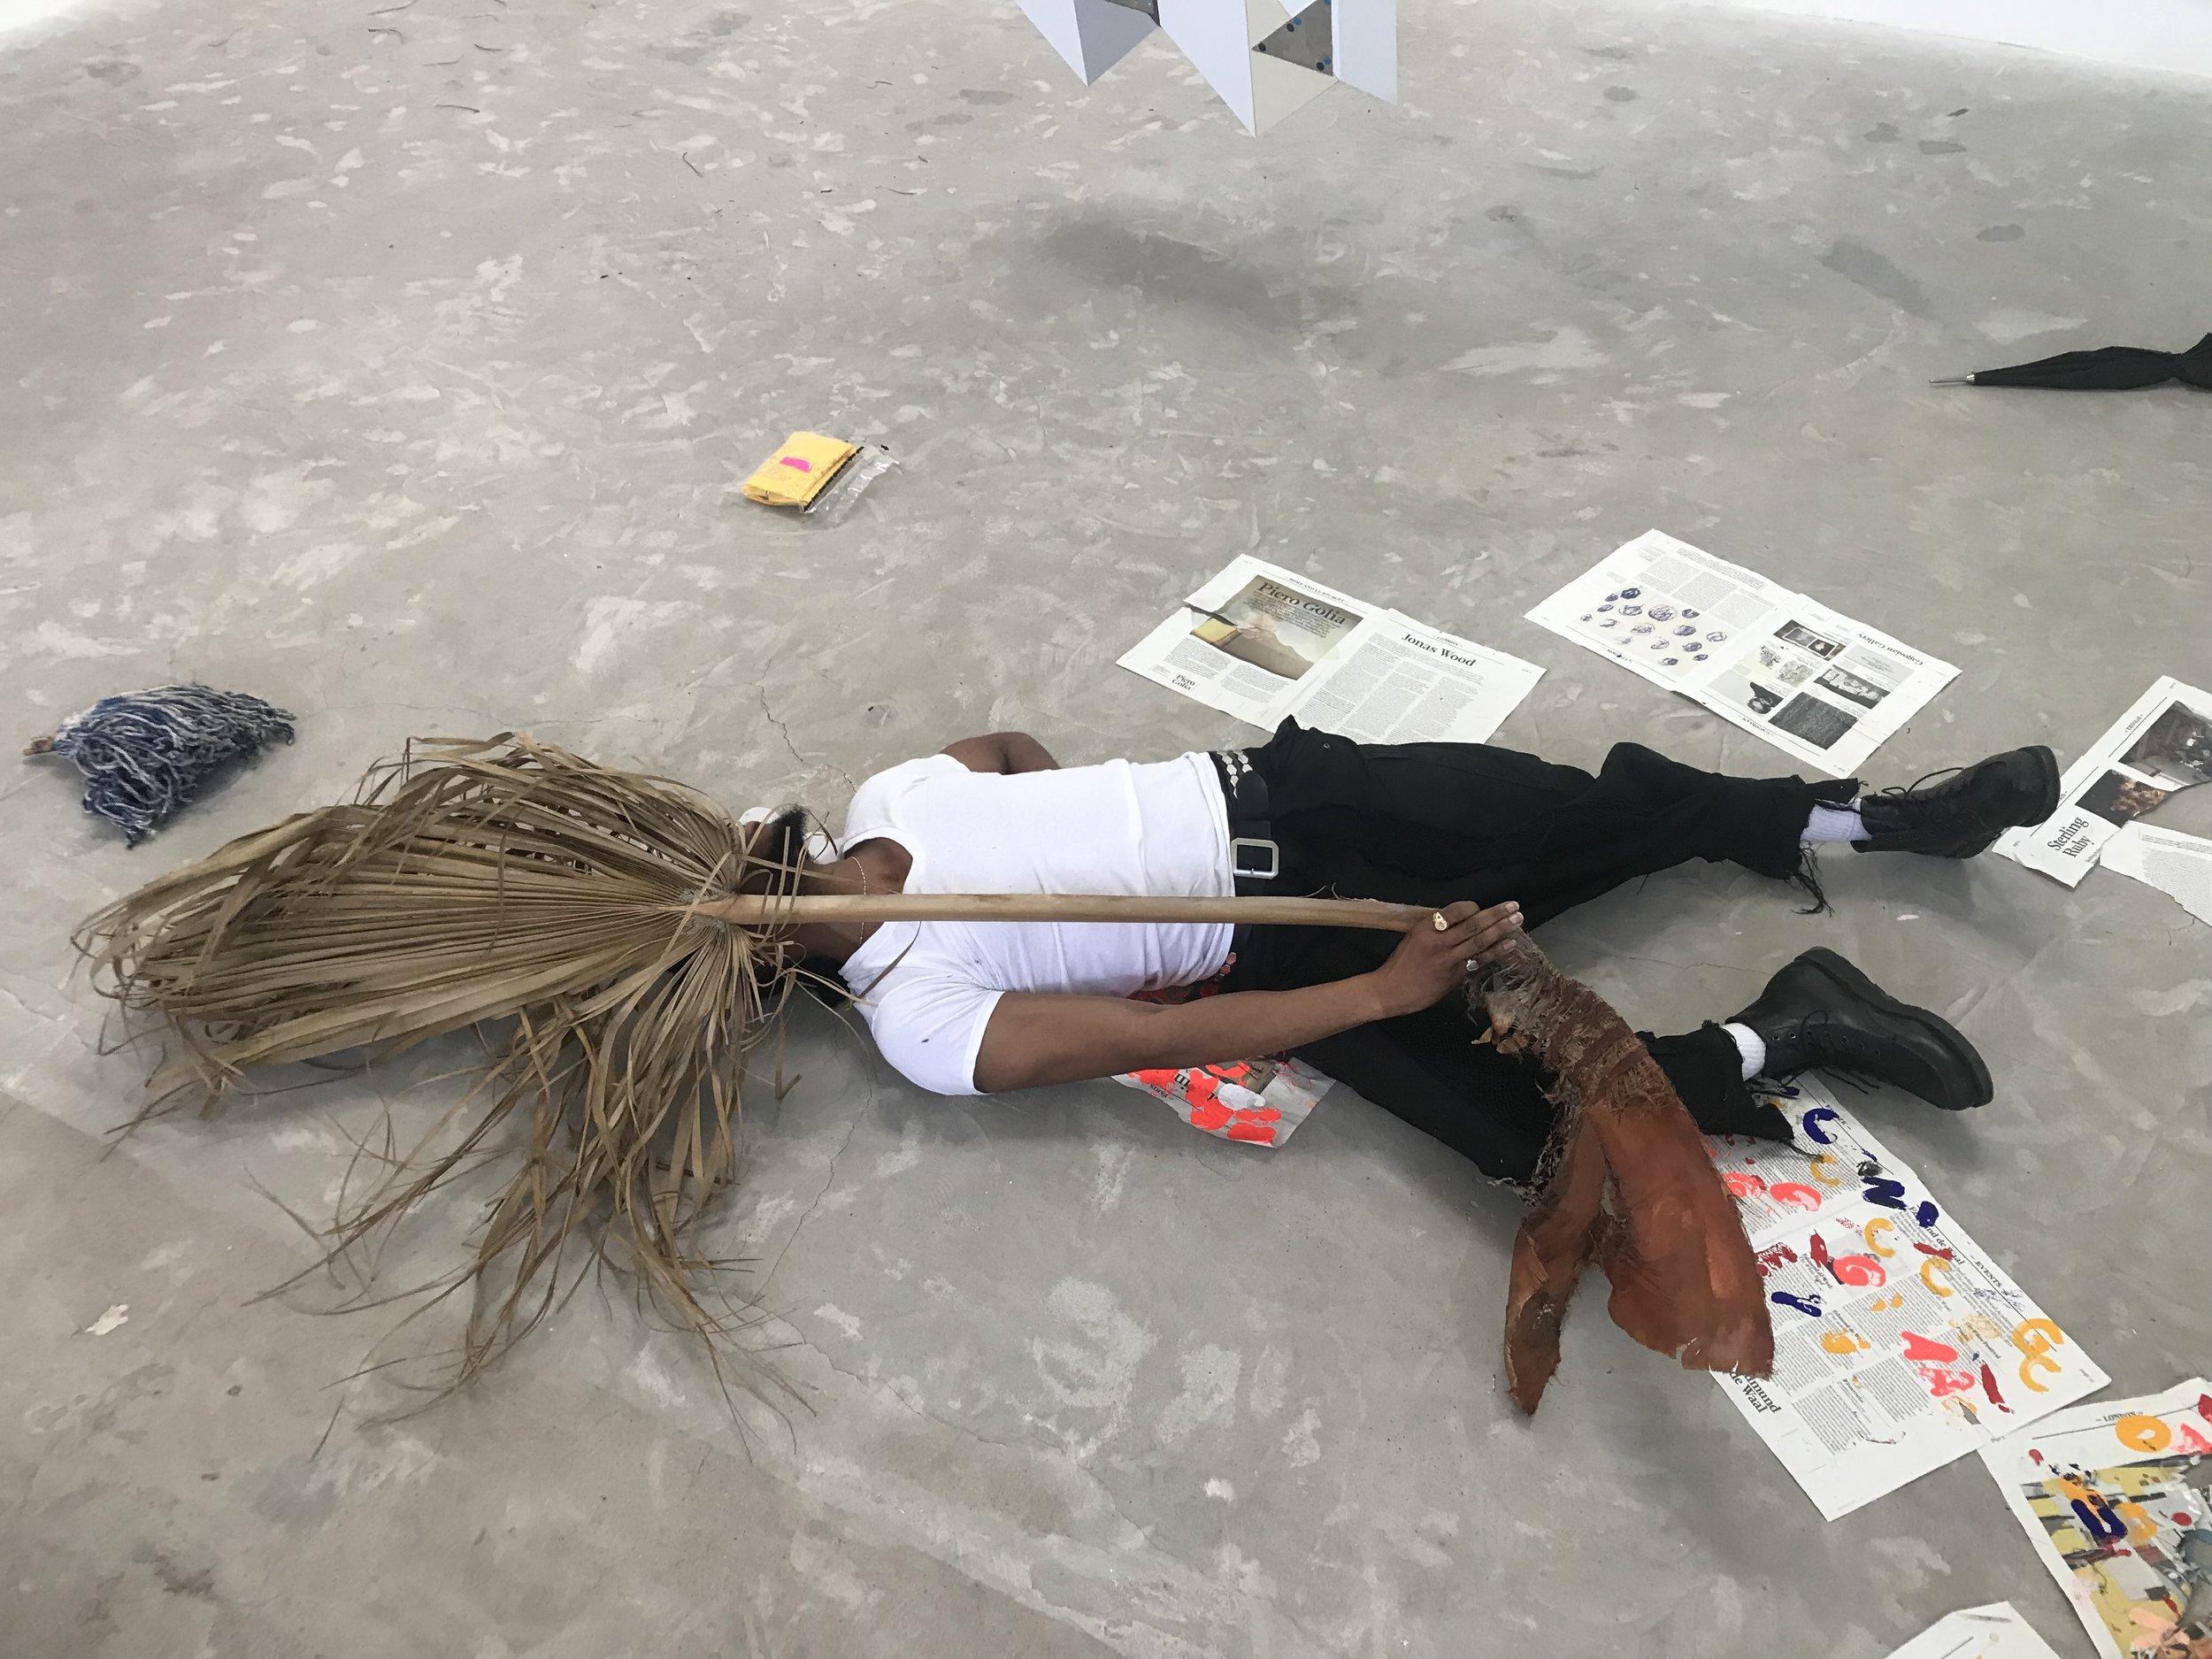 sweeping body across the floor